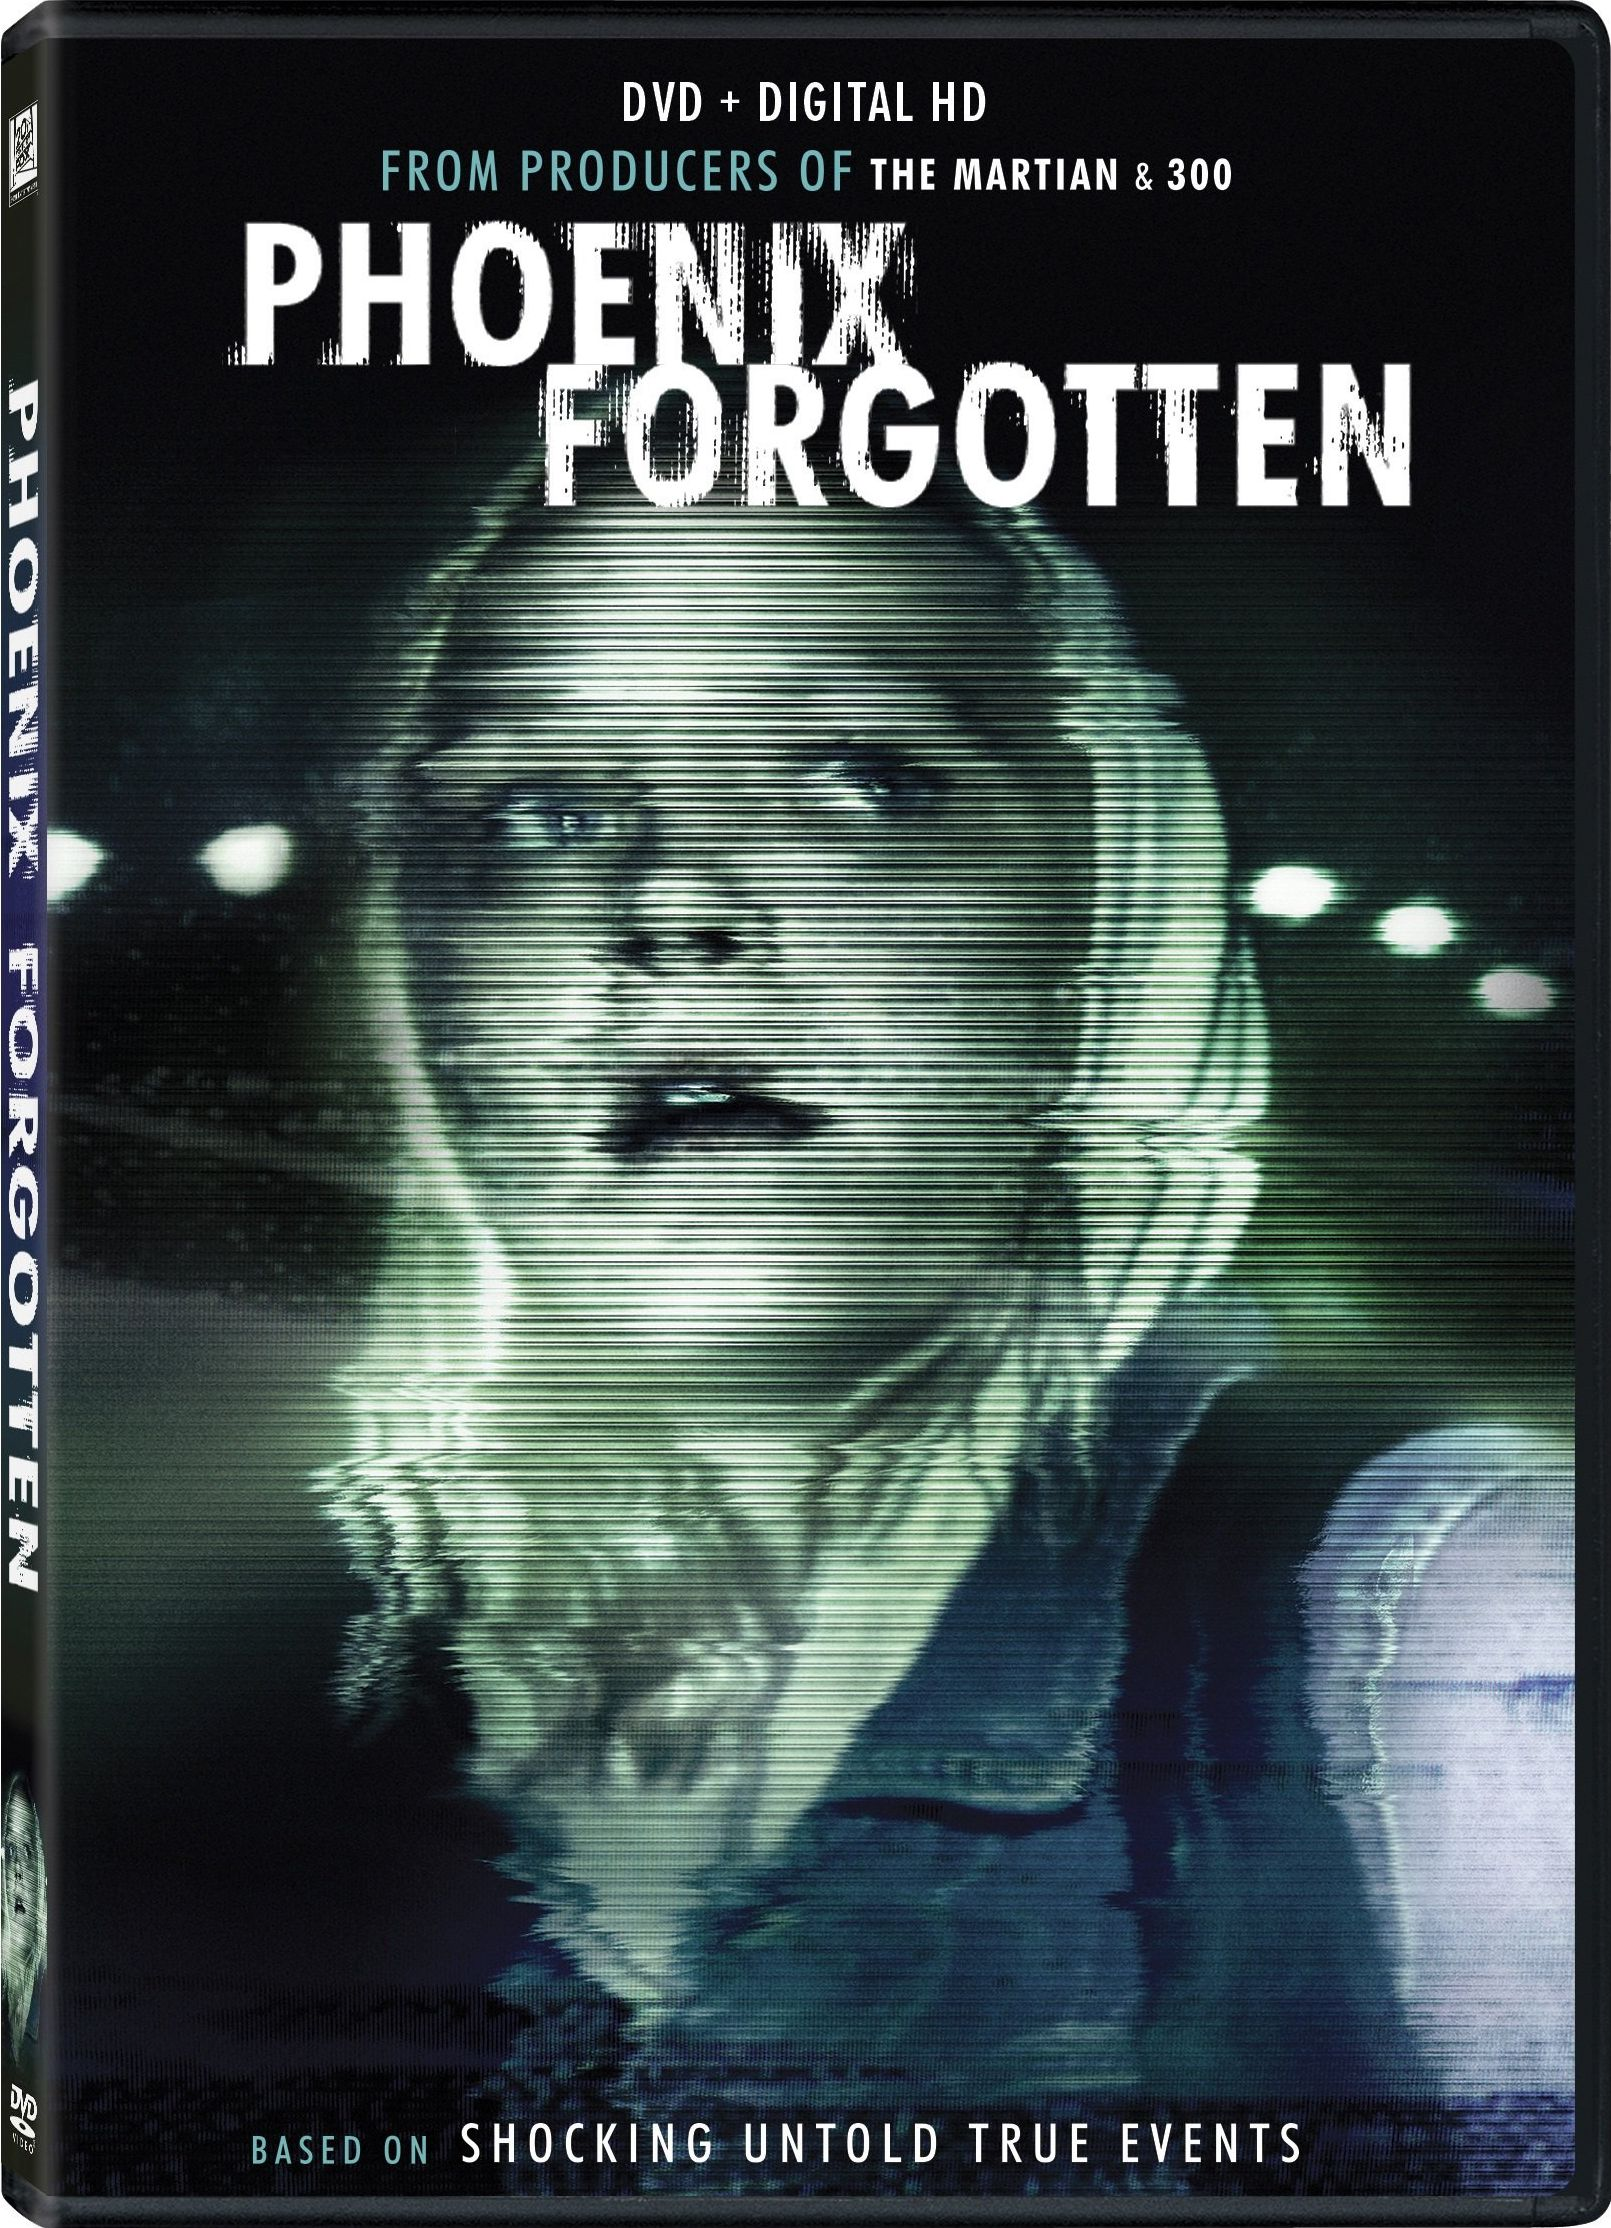 Phoenix Forgotten DVD Release Date August 1 2017